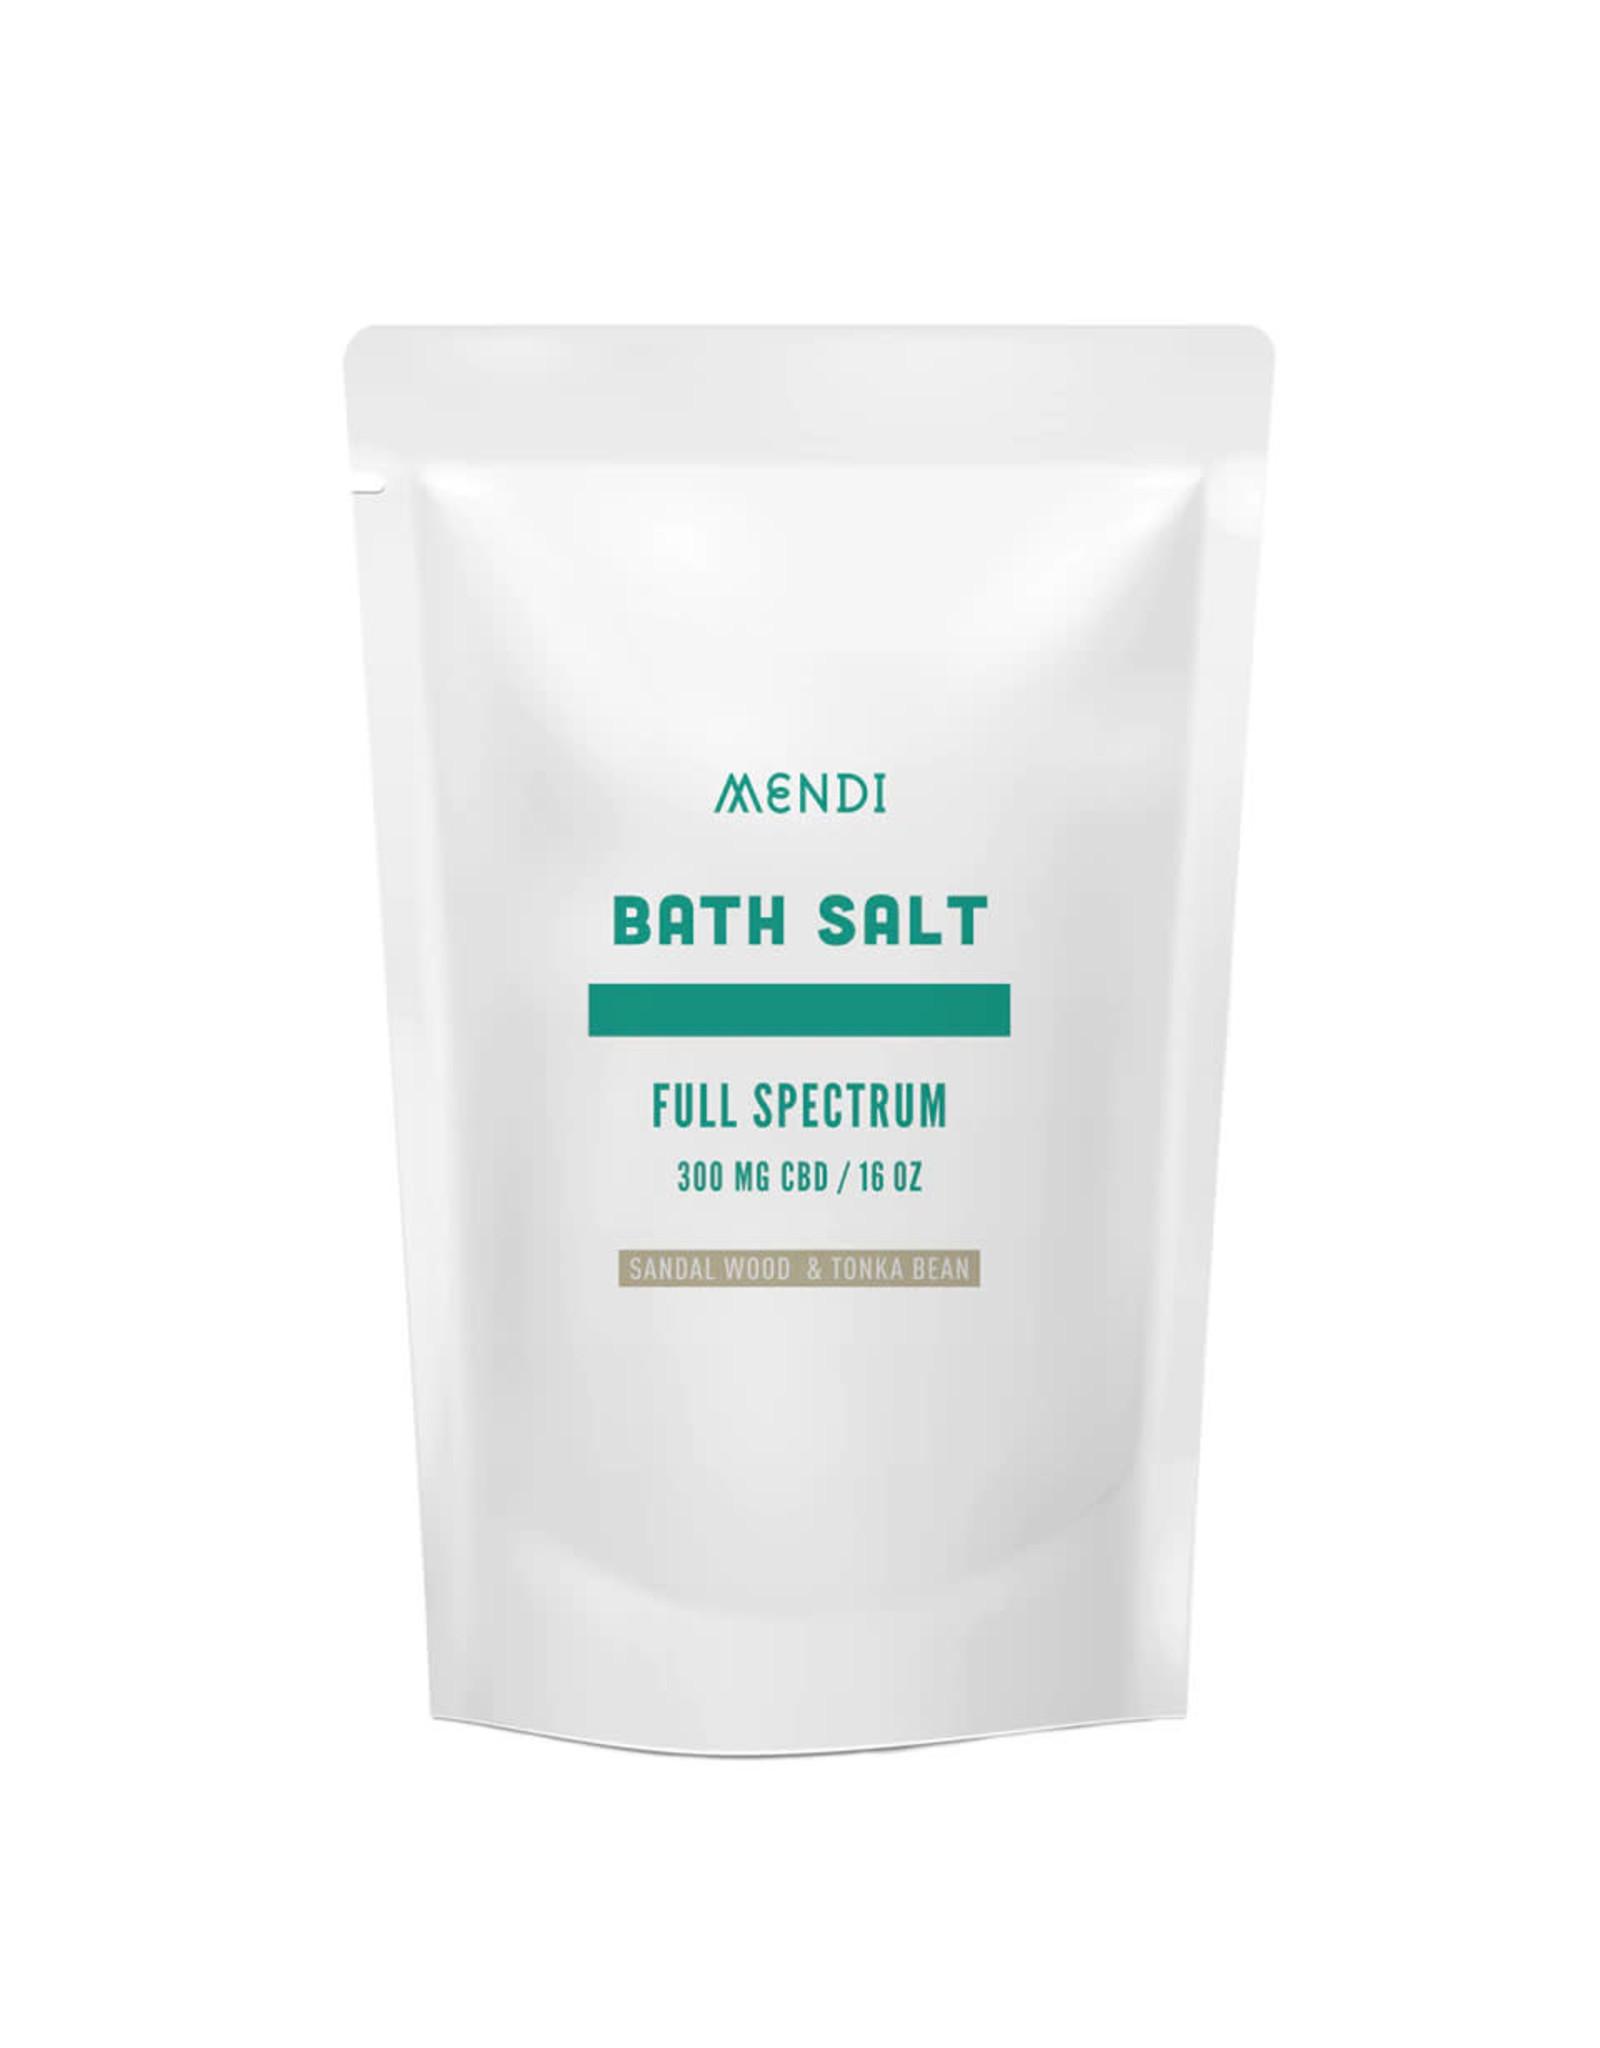 Mendi Mendi Full Spectrum 300mg  Sandalwood Bath Salts 16oz